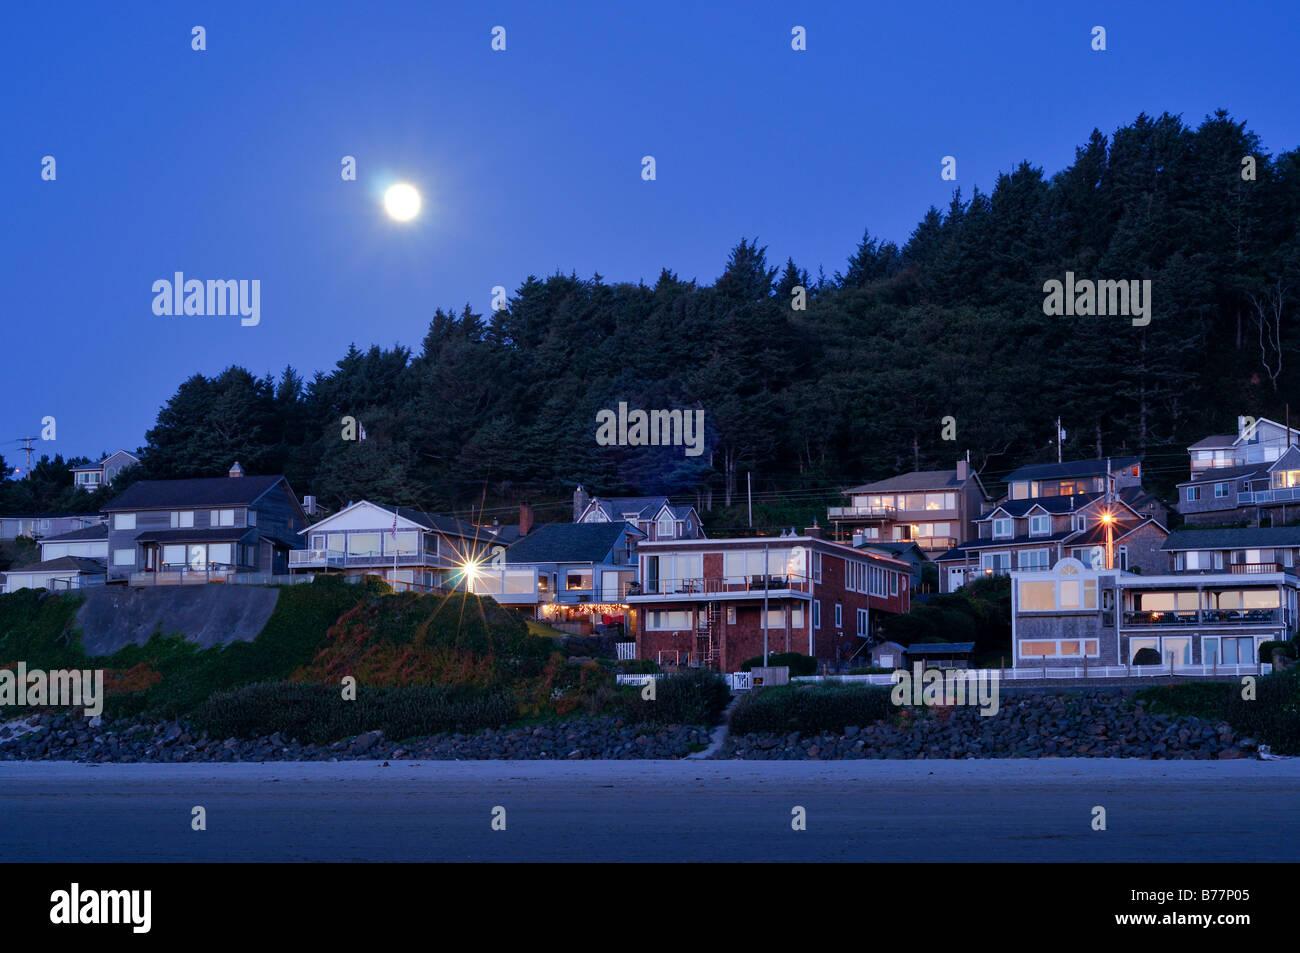 Cannon Beach under full moon, Cannon Beach, Clatsop County, Oregon, USA, North America - Stock Image